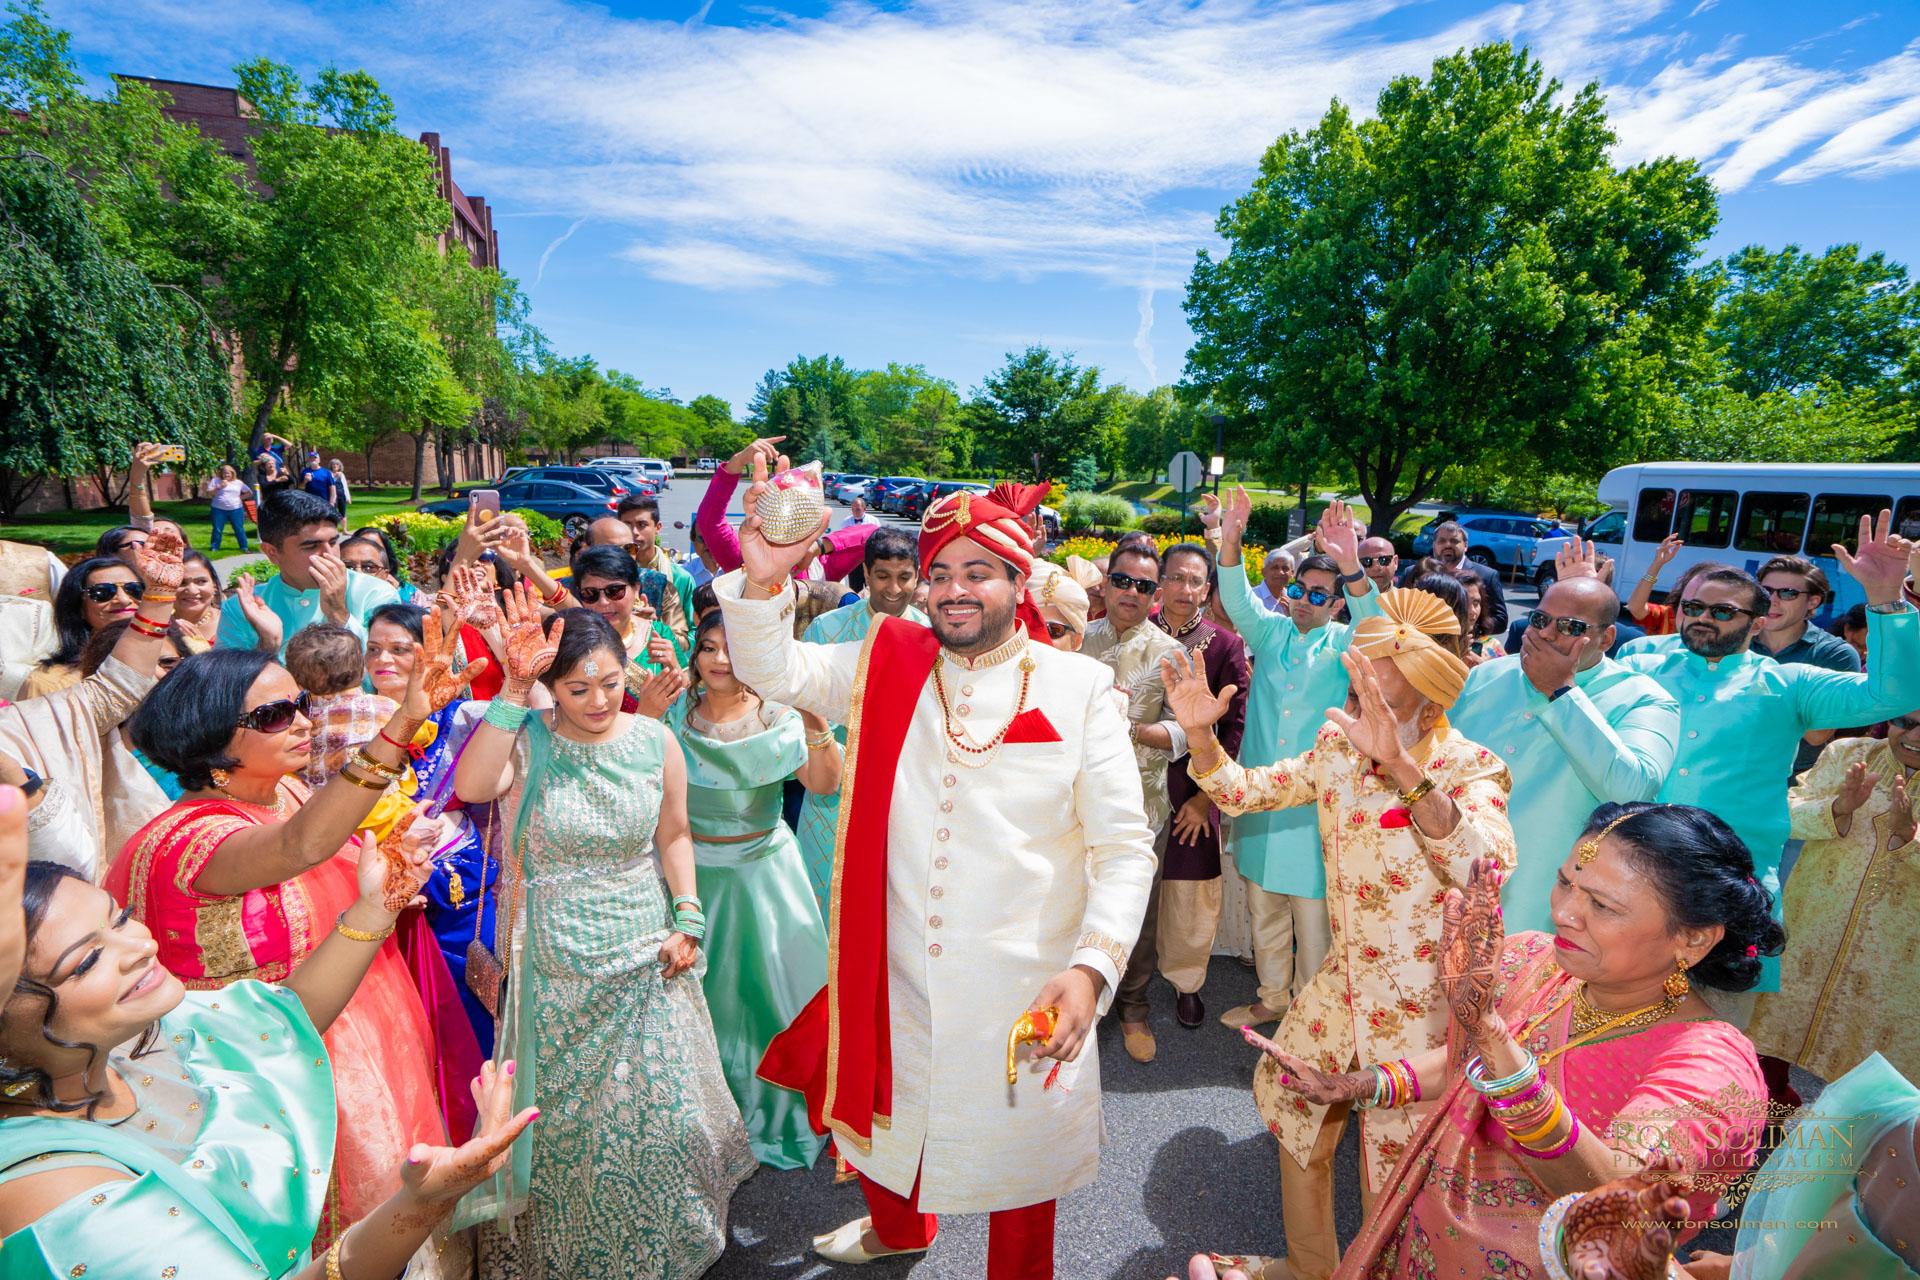 HILTON PARSIPANNY INDIAN WEDDING 21